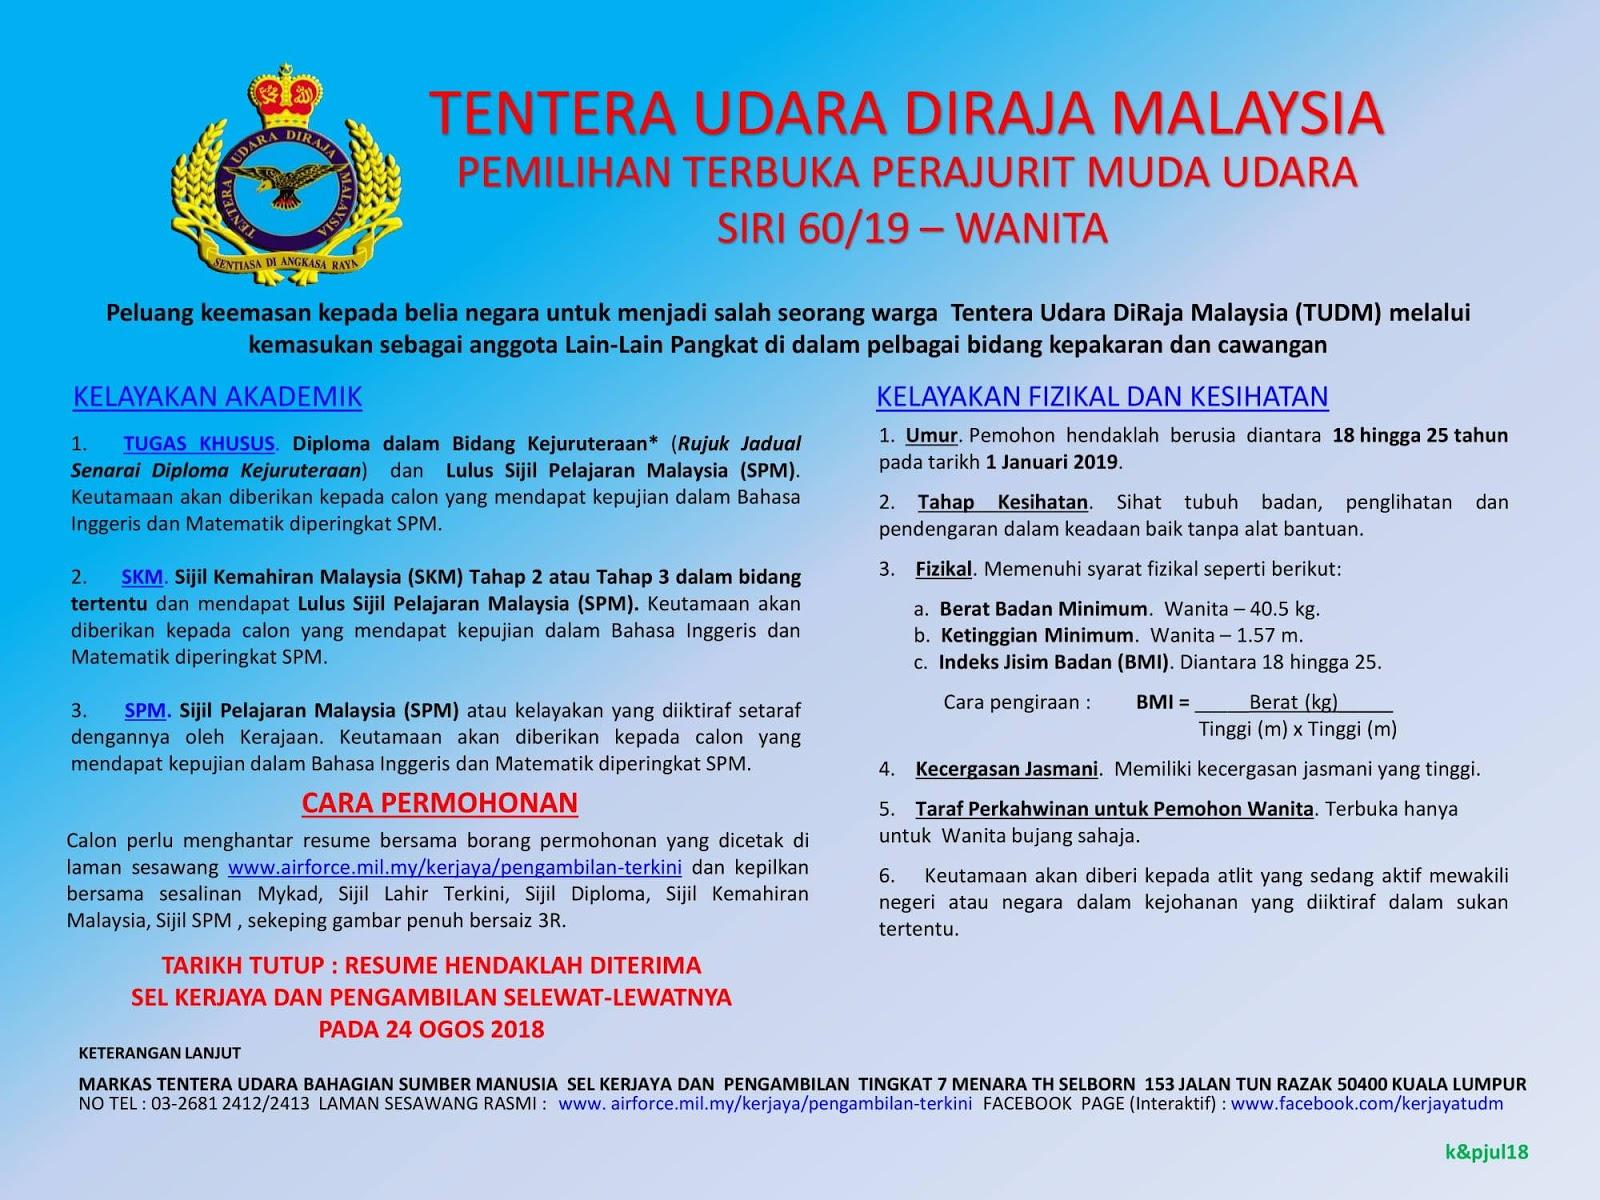 Pengambilan Perajurit Muda Wanita Tentera Udara Diraja Malaysia Tudm 24 Ogos 2018 Appjawatan Malaysia